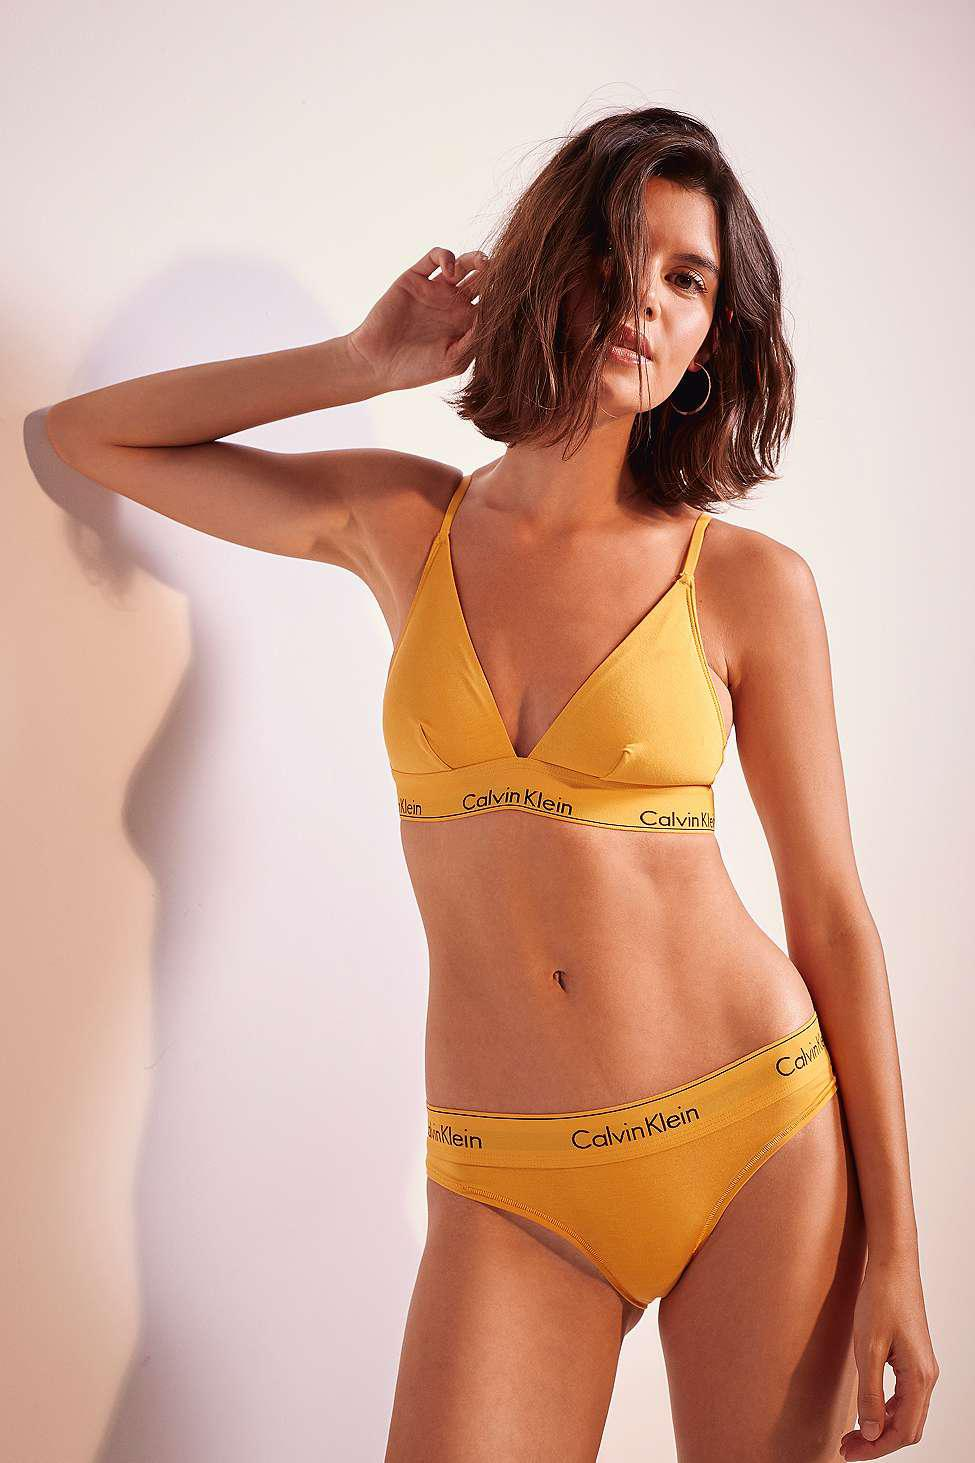 ed1cc0442e Calvin Klein Terracotta Orange Triangle Bralette - Womens Xs in ...